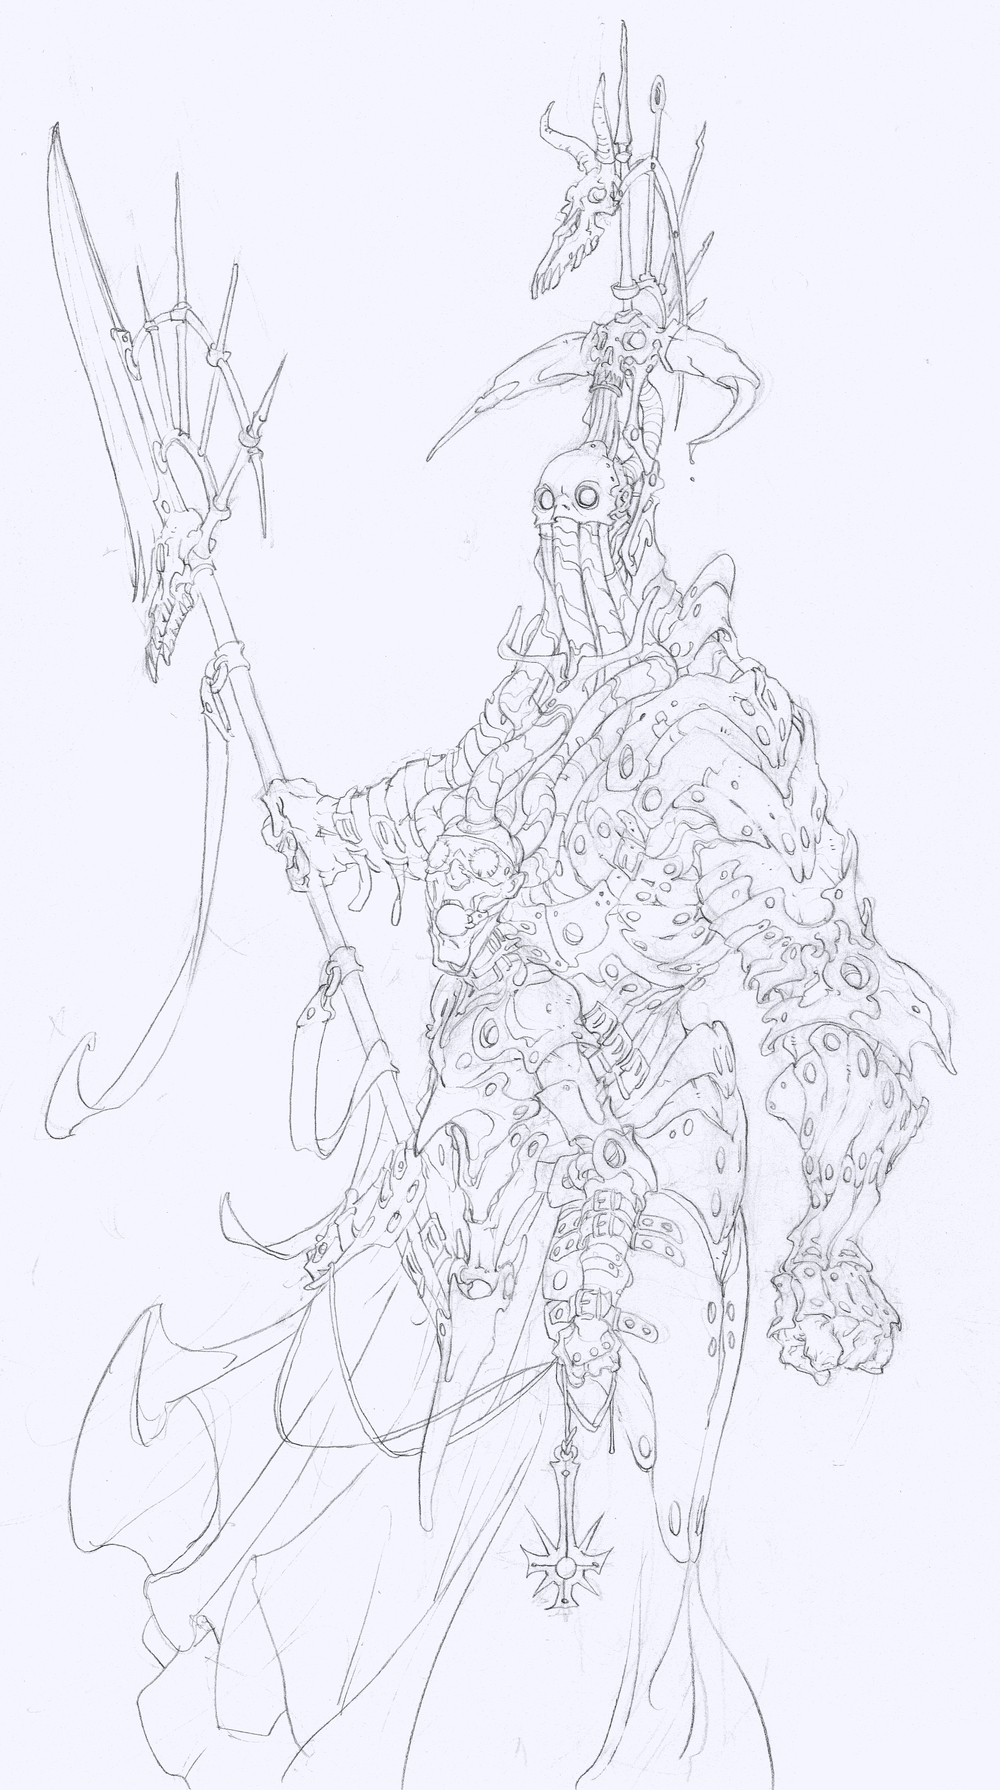 Rackham | Confrontation/Rag'Narok/Hybrid - Alchemists of Dirz | Edouard Guiton